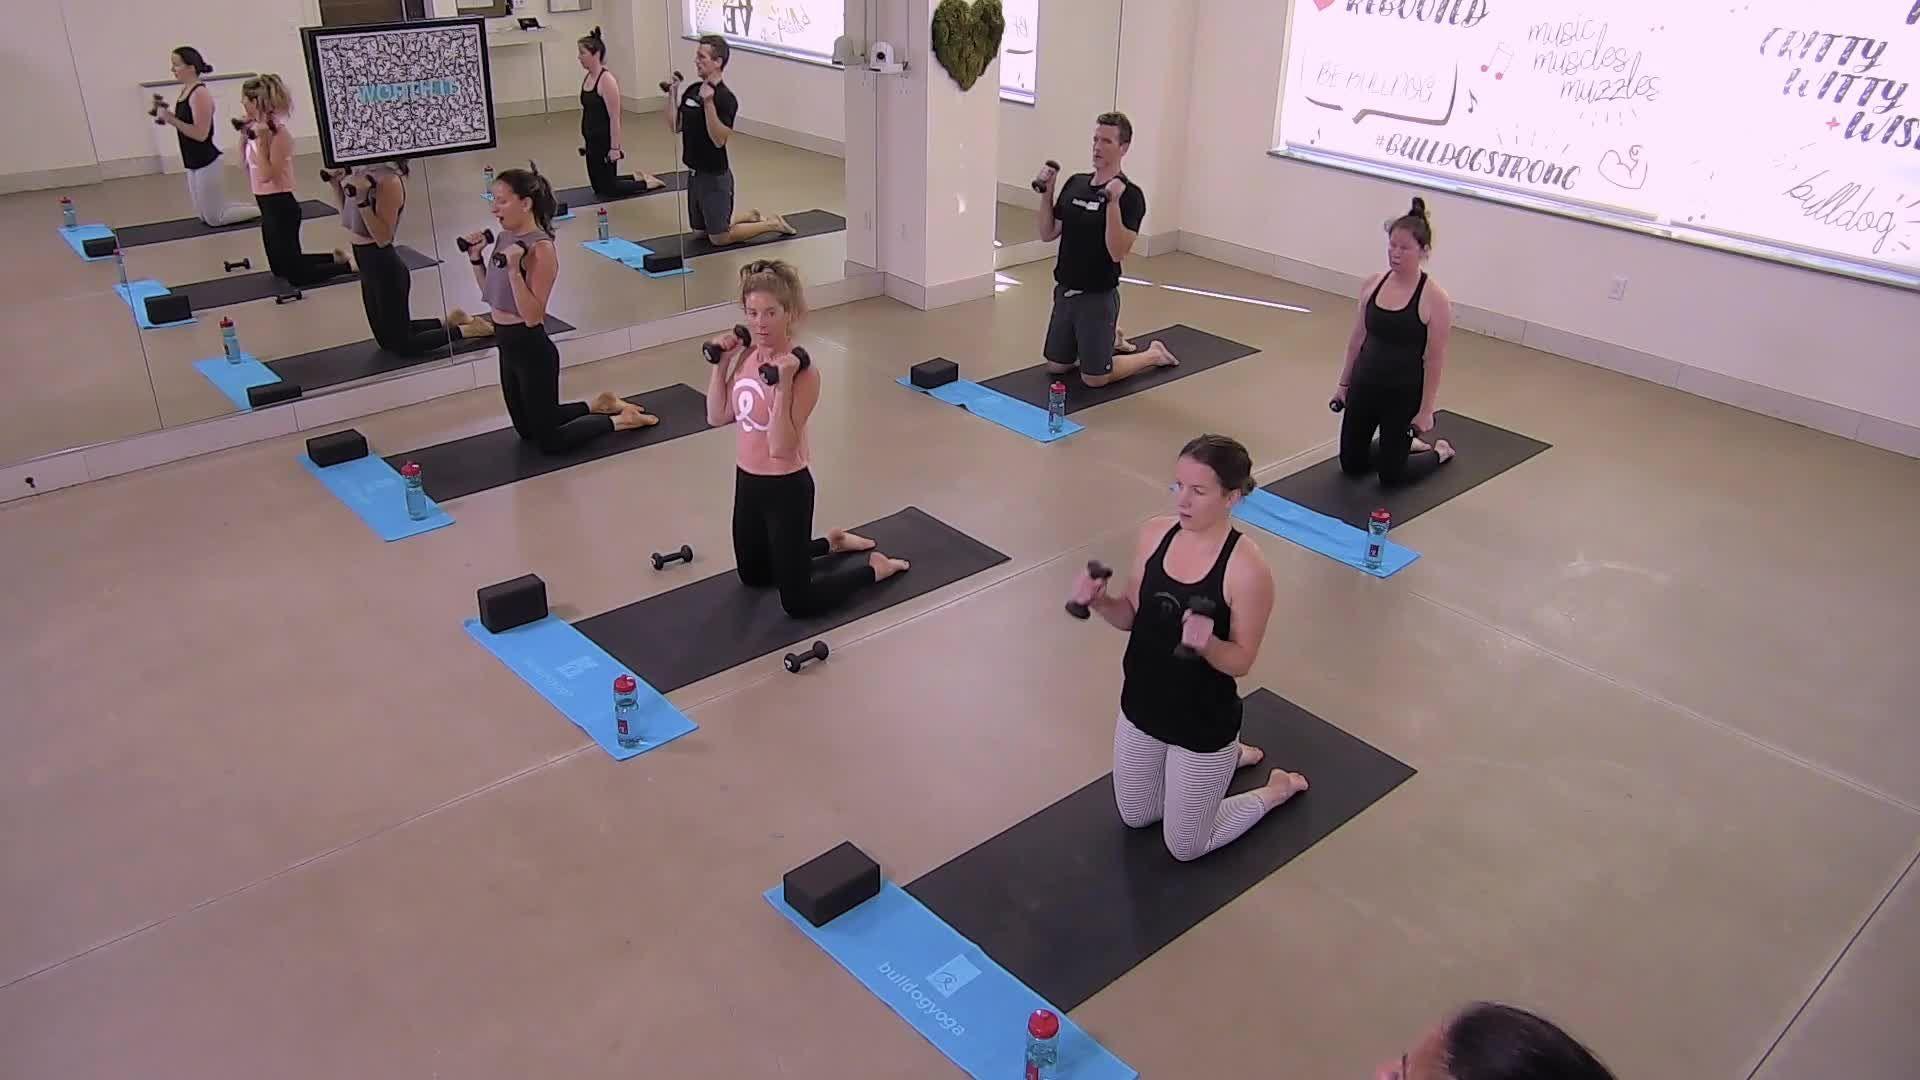 Yoga Sculpt - Full Body